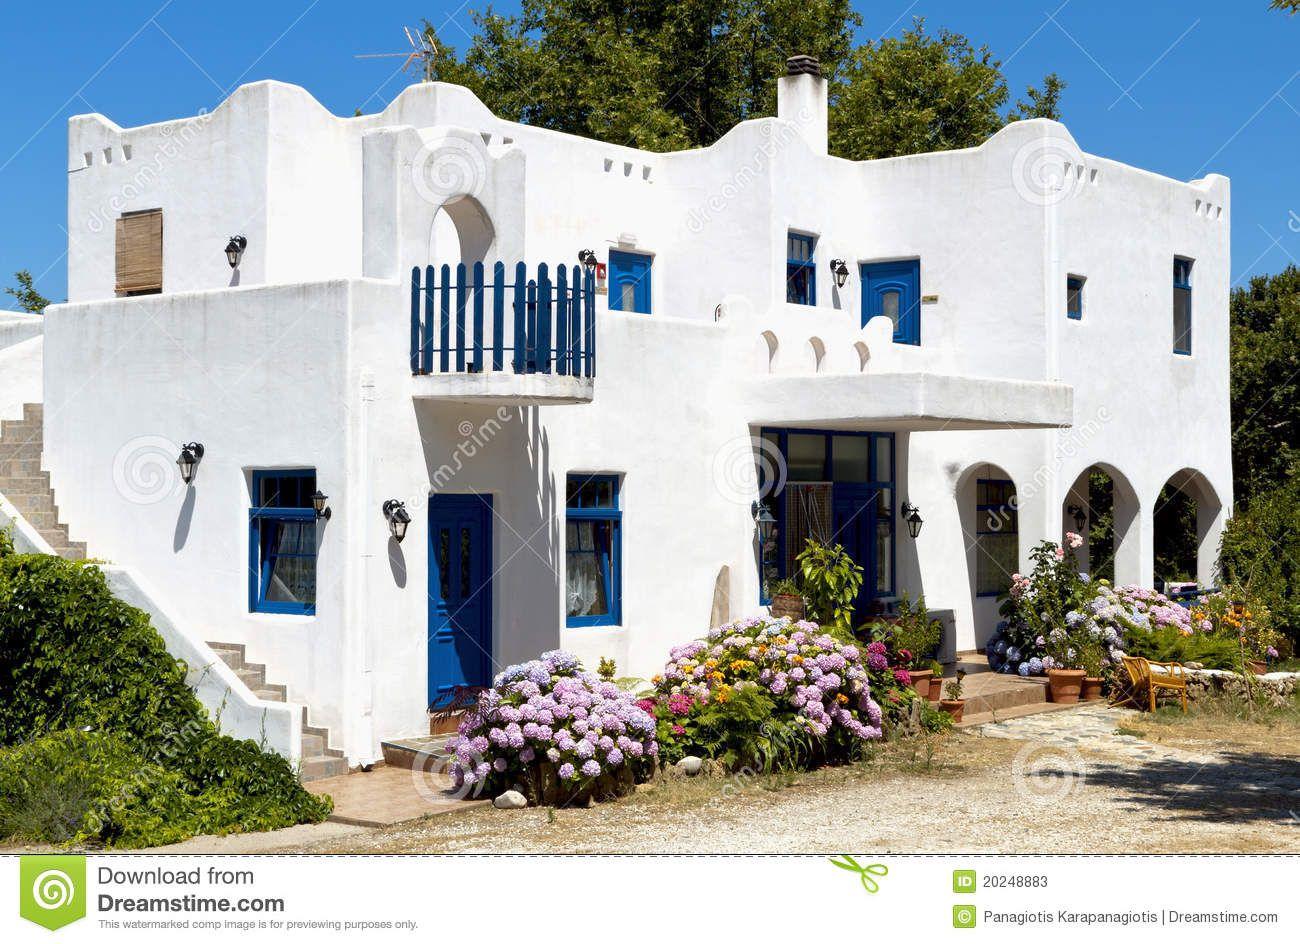 Risultati immagini per greek house Greek Houses Pinterest